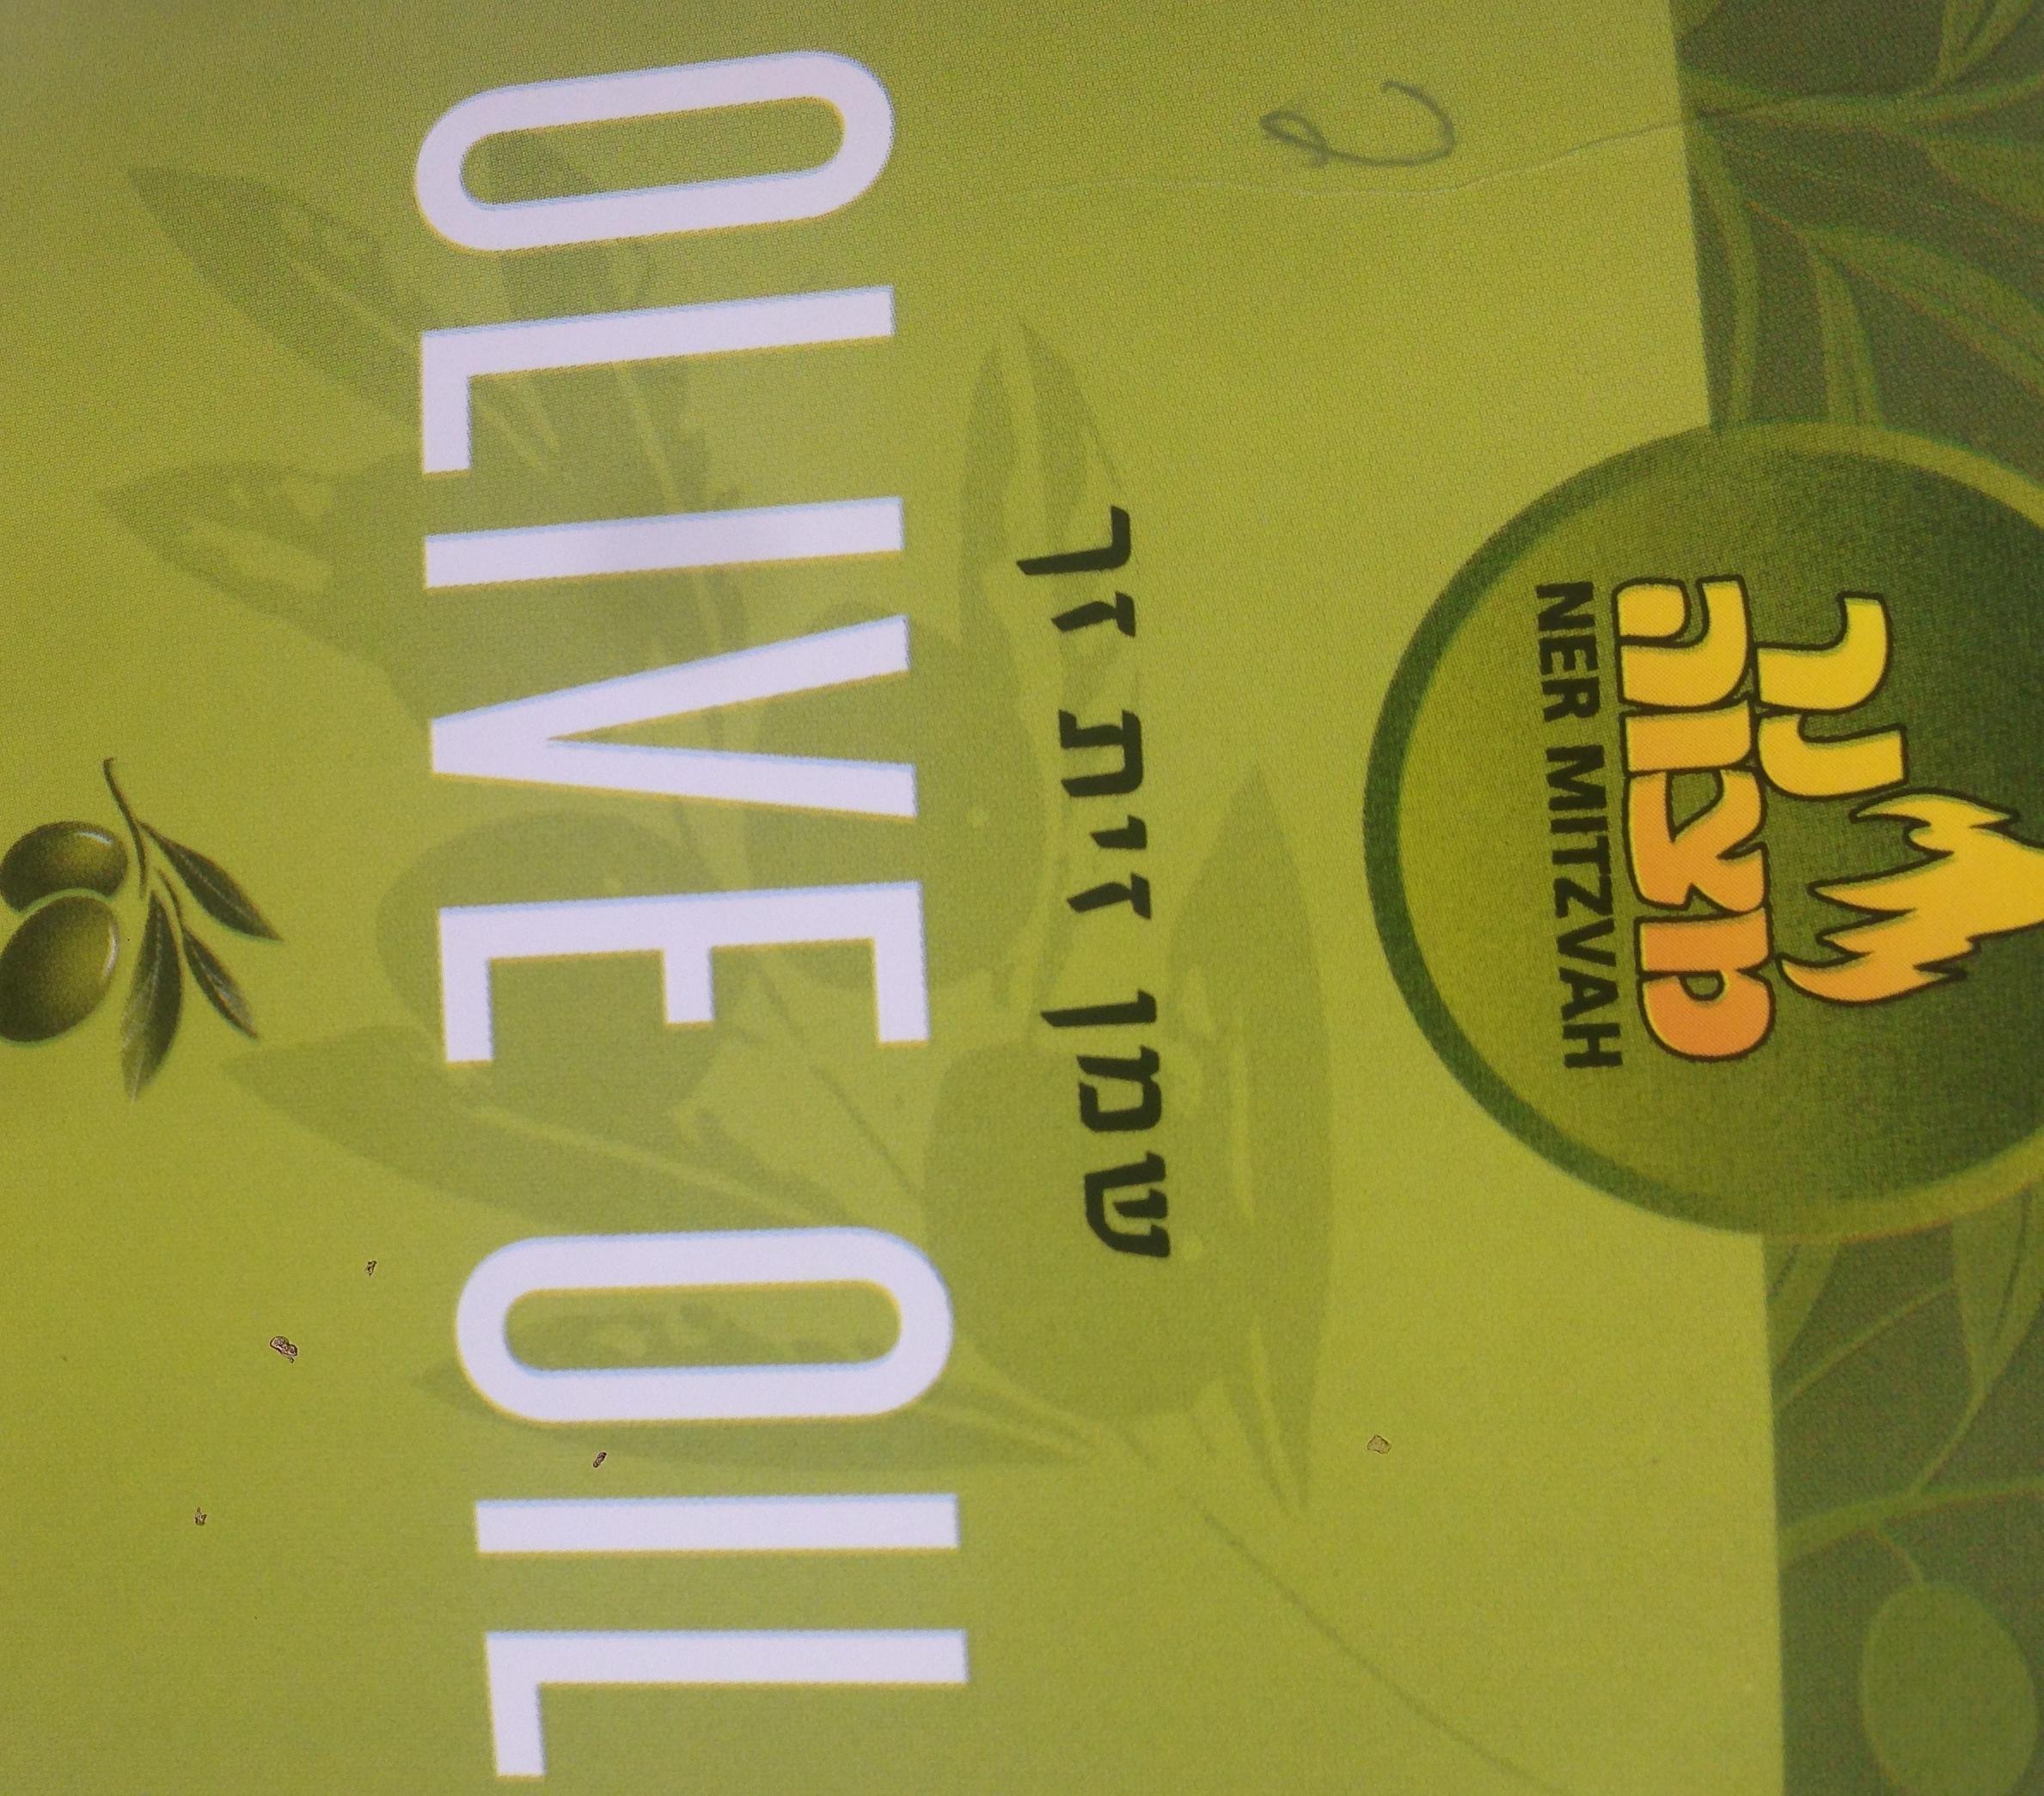 Ner Mitzvah Olive Oil 128 Oz. Pack Of 1. by Ner Mitzvah (Image #1)